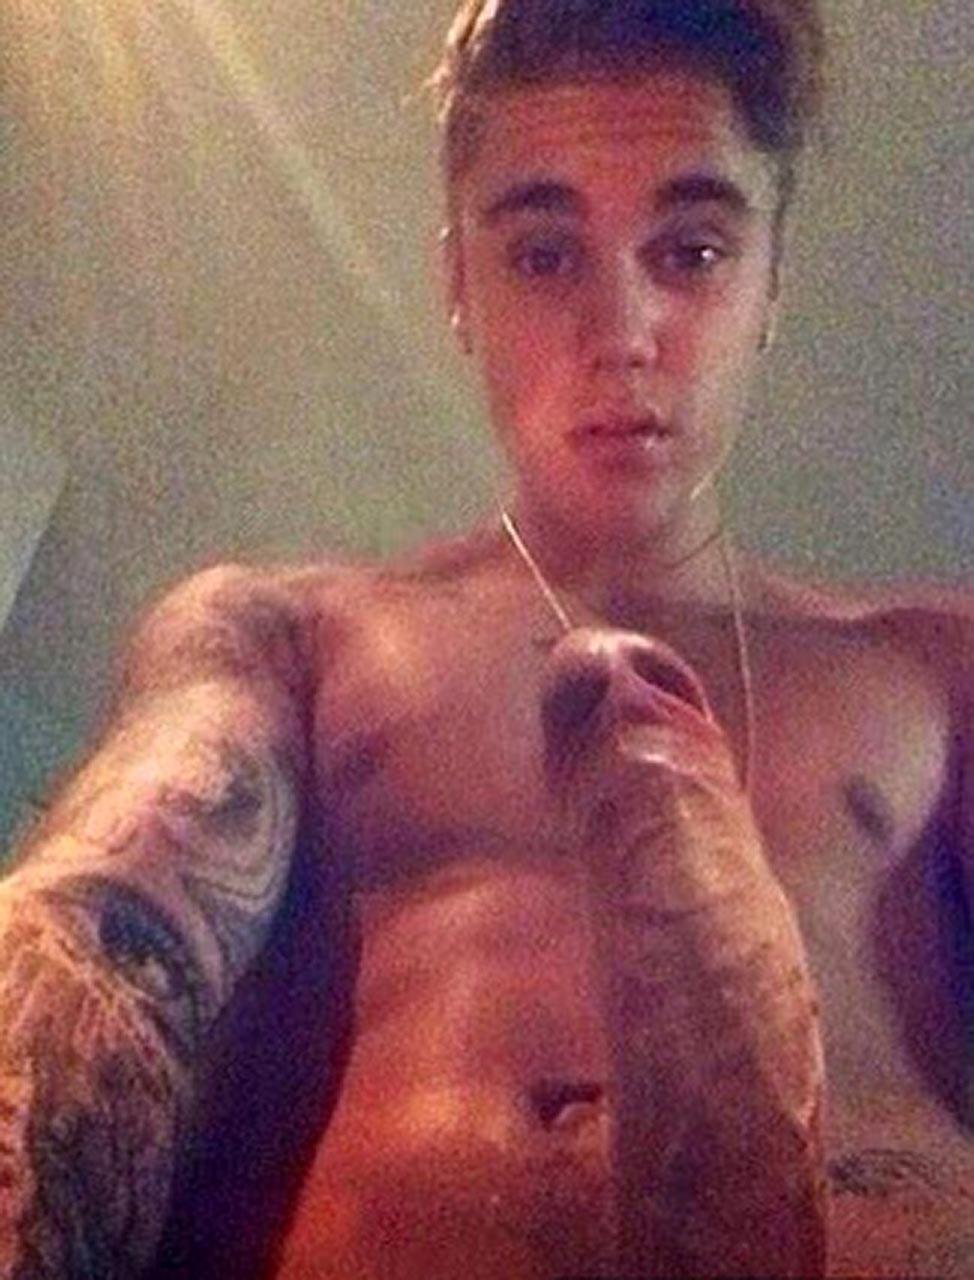 Justin Bieber Dick Pic Leak photo 9